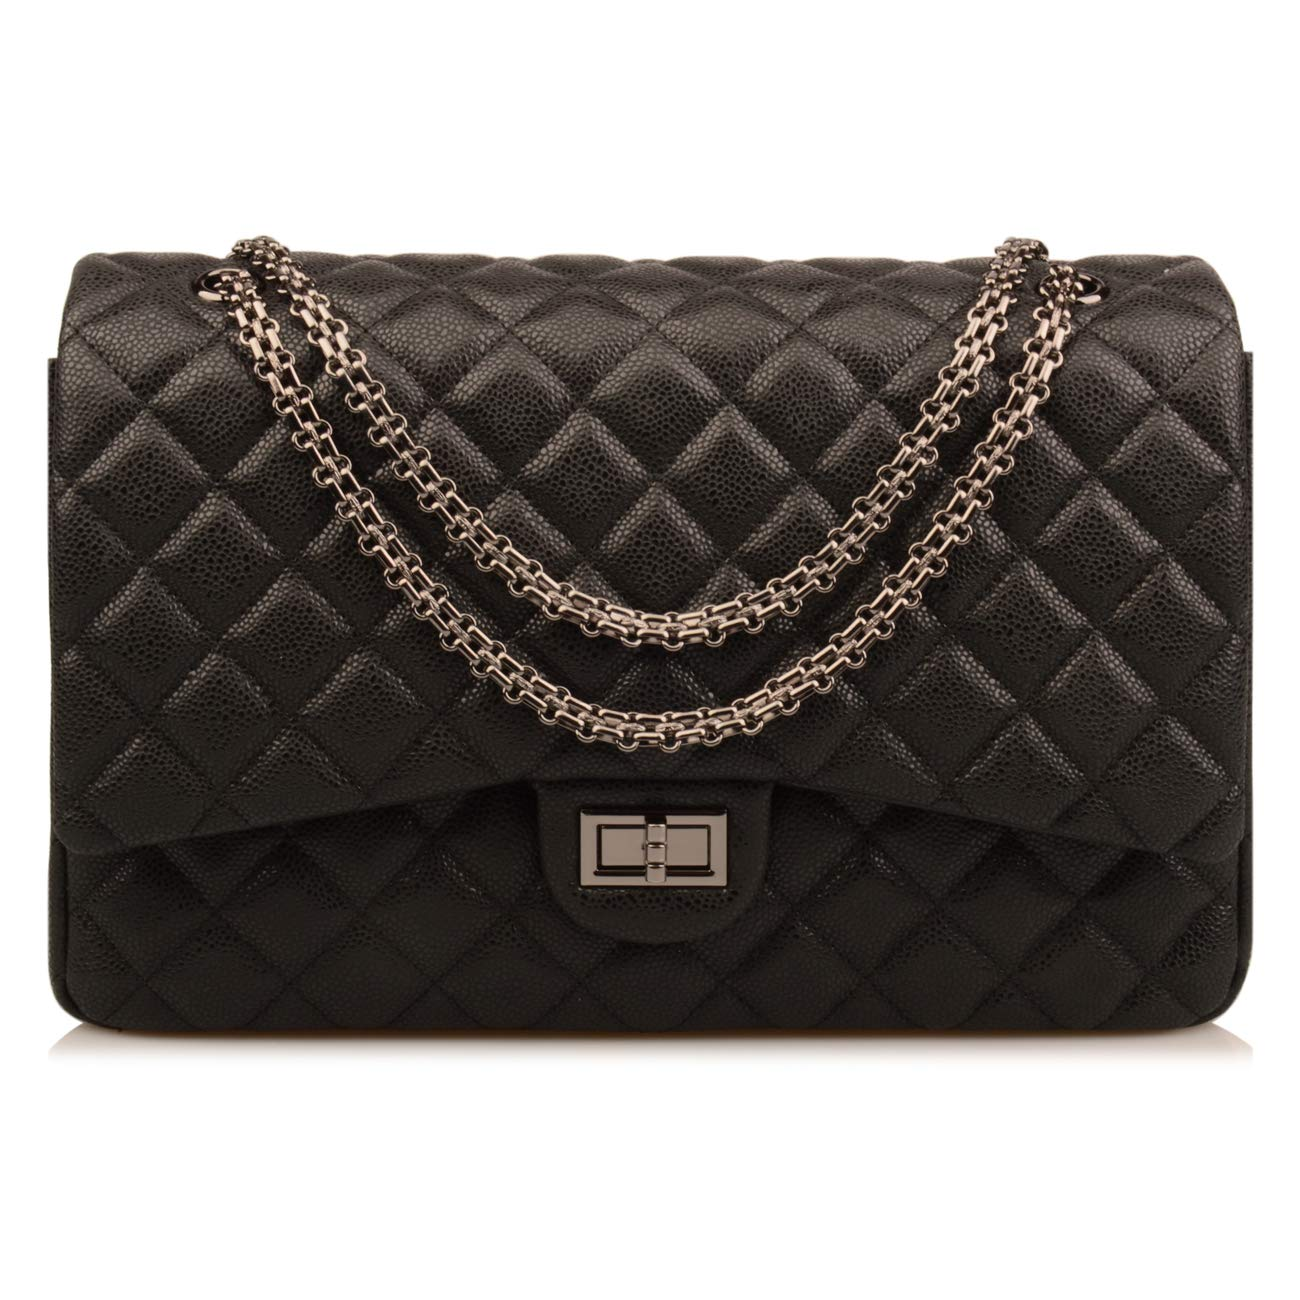 73cd782be7ca Amazon.com: Ainifeel Women's Quilted Oversize Genuine Leather Shoulder  Handbag Hobo Bag Purse (X-Large, Black (stiff cow leather gunmetal hardware)):  Shoes